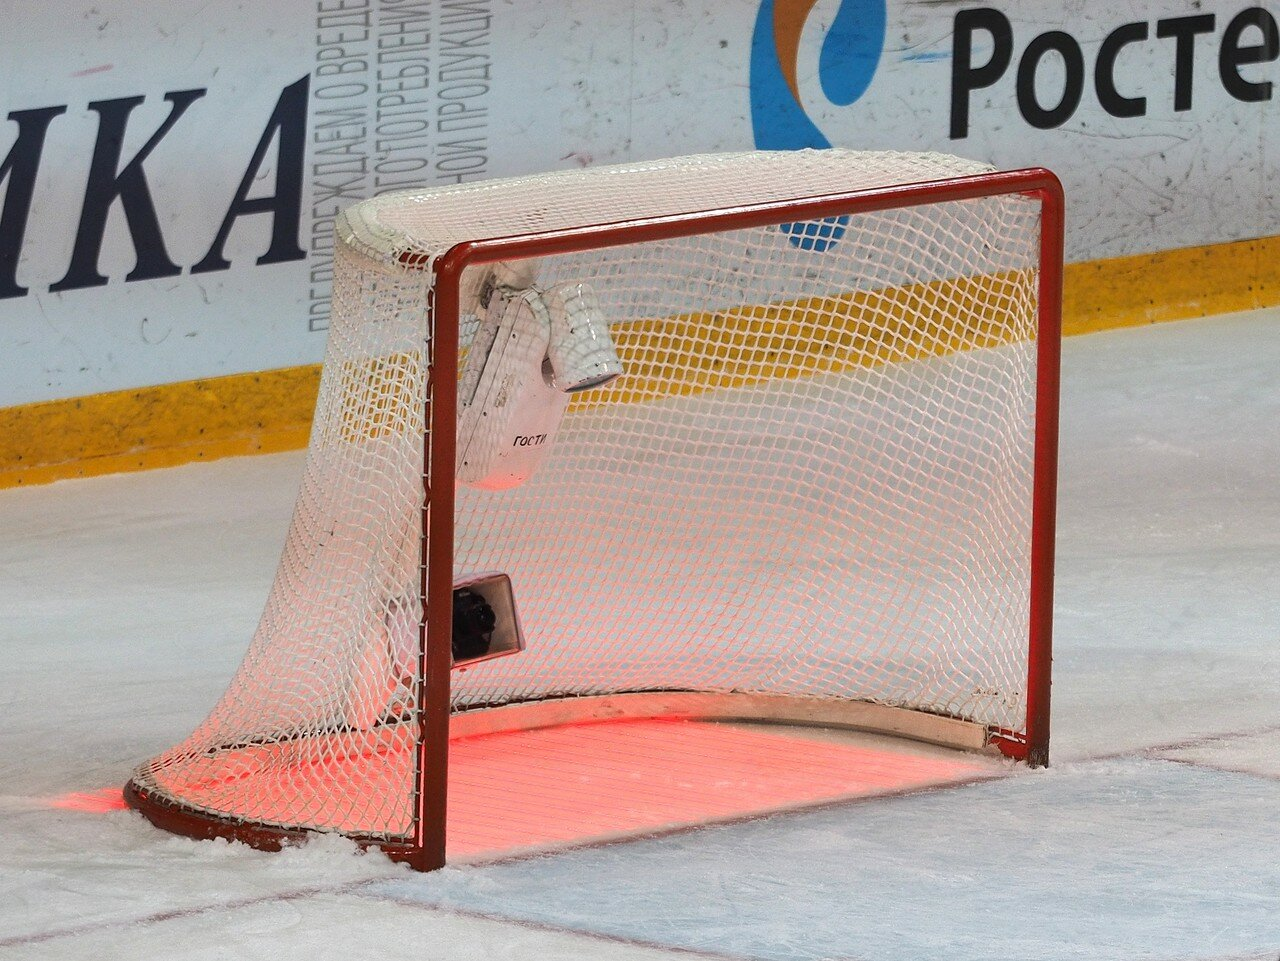 98Плей-офф 2016 Восток 1/2 Металлург - Сибирь 10.03.2016